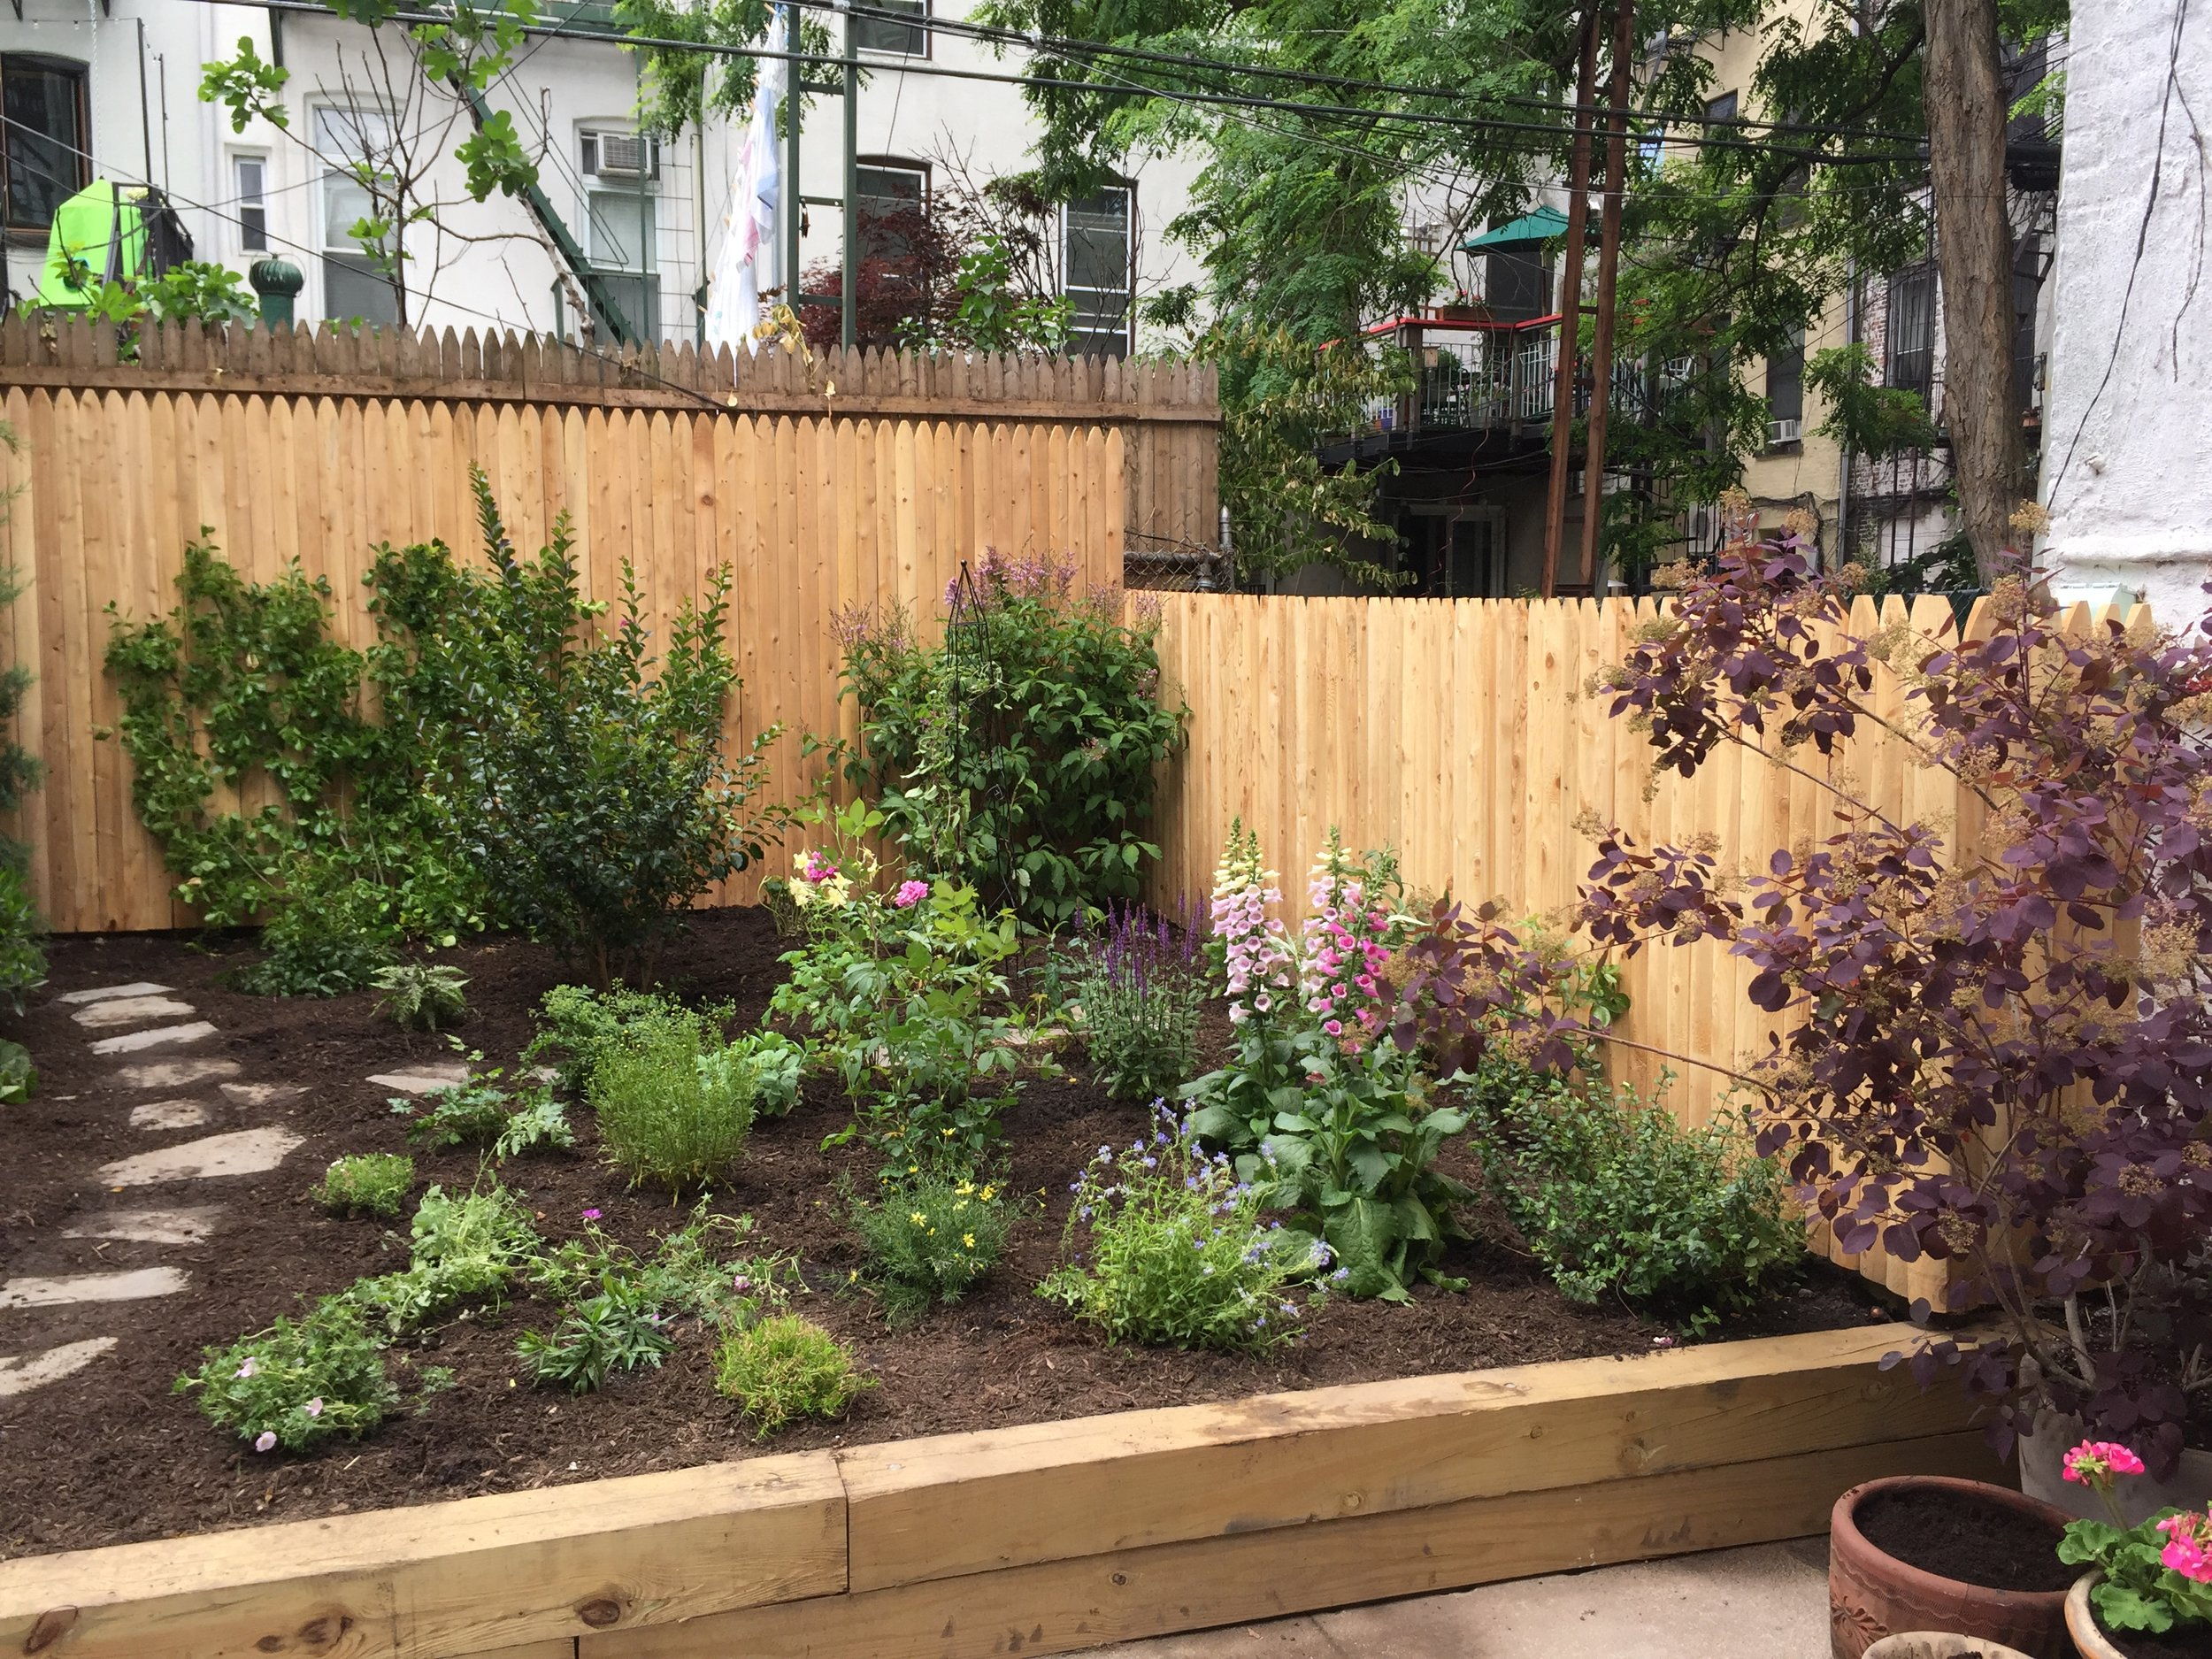 Park Slope Backyard Transformation - New Planting